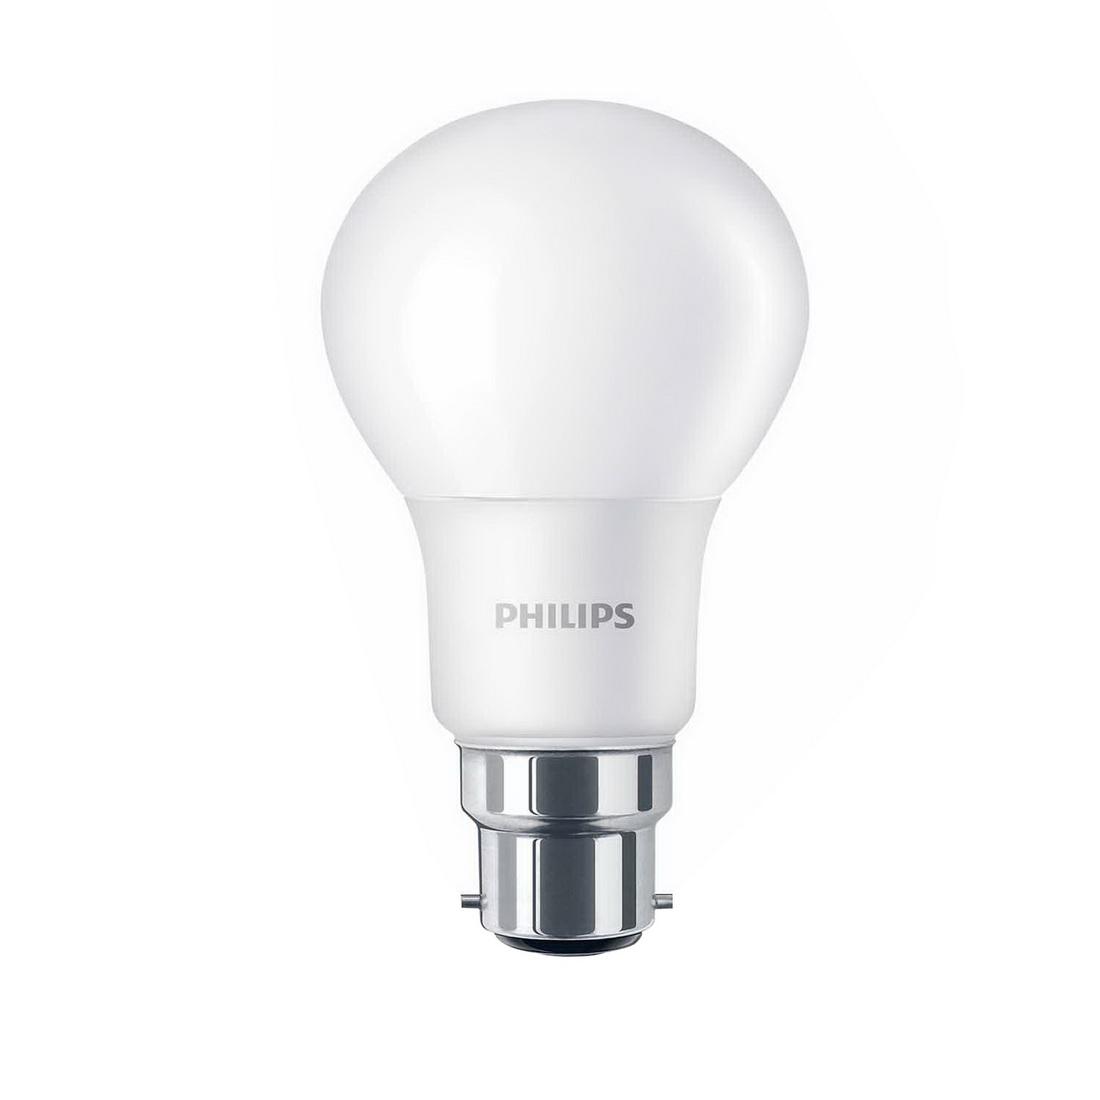 Ezi Living 12W 1360lm B22 3000K Generation 8 A60 Non-Dimmable LED Bulb Warm White